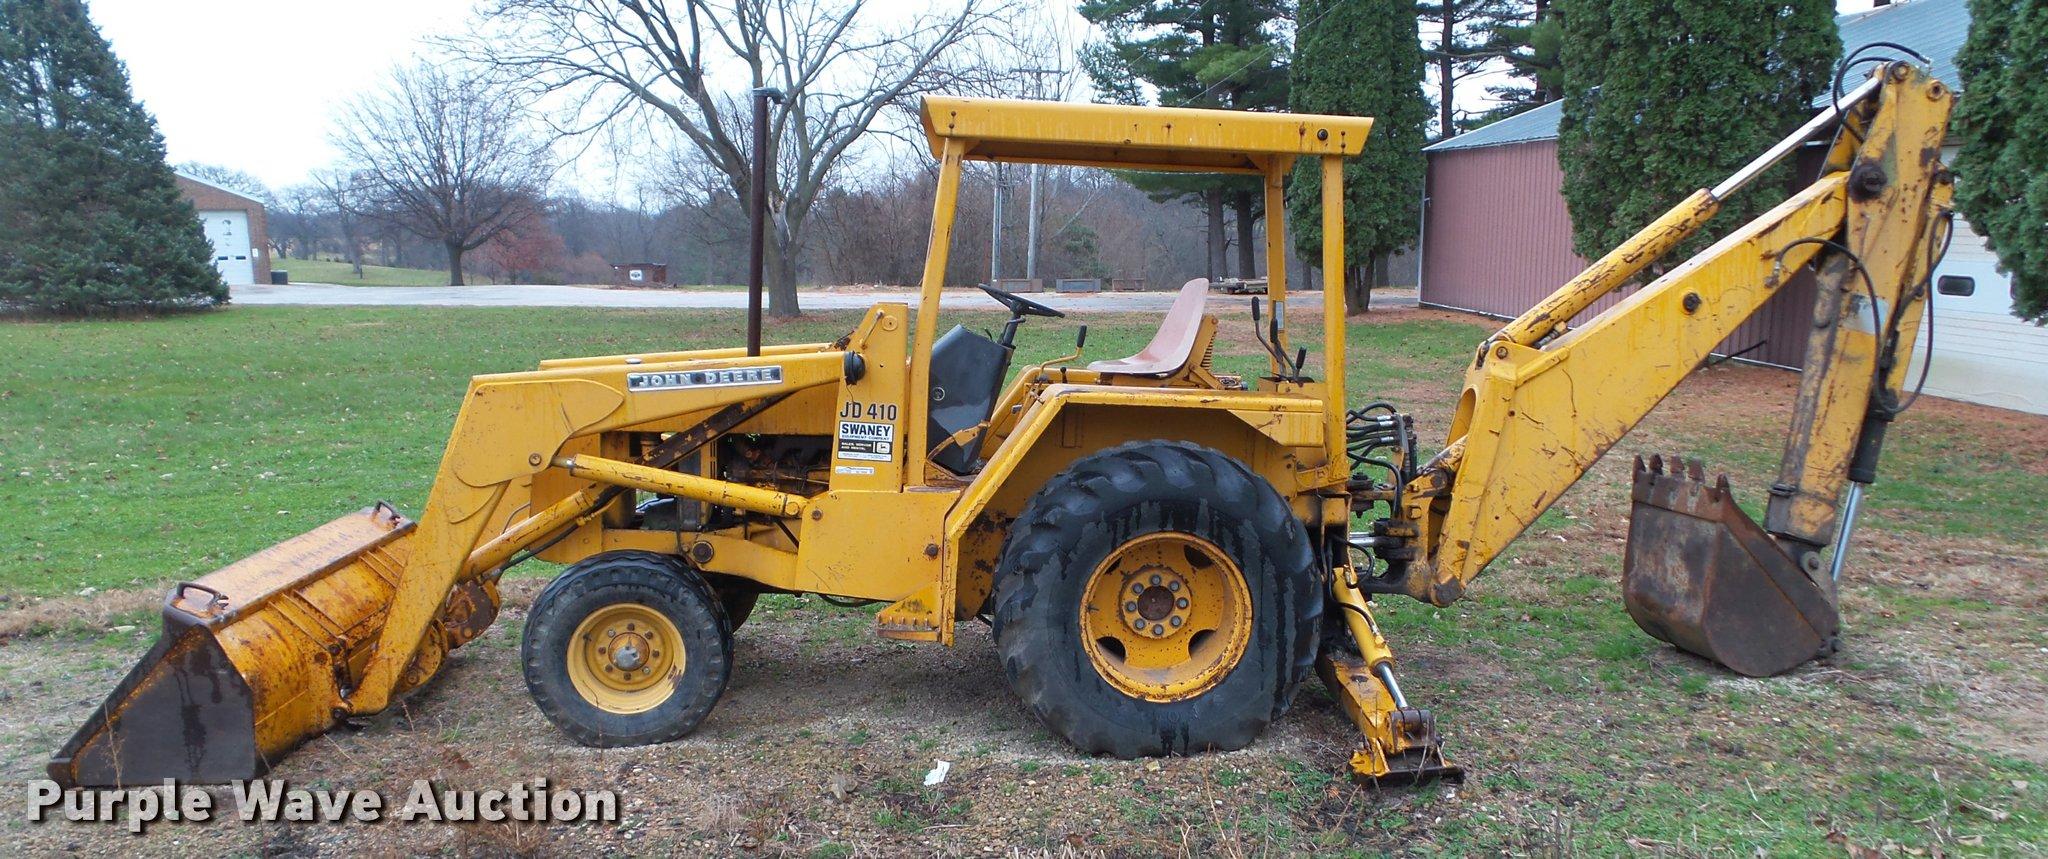 1976 john deere 410 backhoe item bz9956 sold december 2 rh purplewave com John  Deere 410 Backhoe Valve John Deere 410B Service Manual